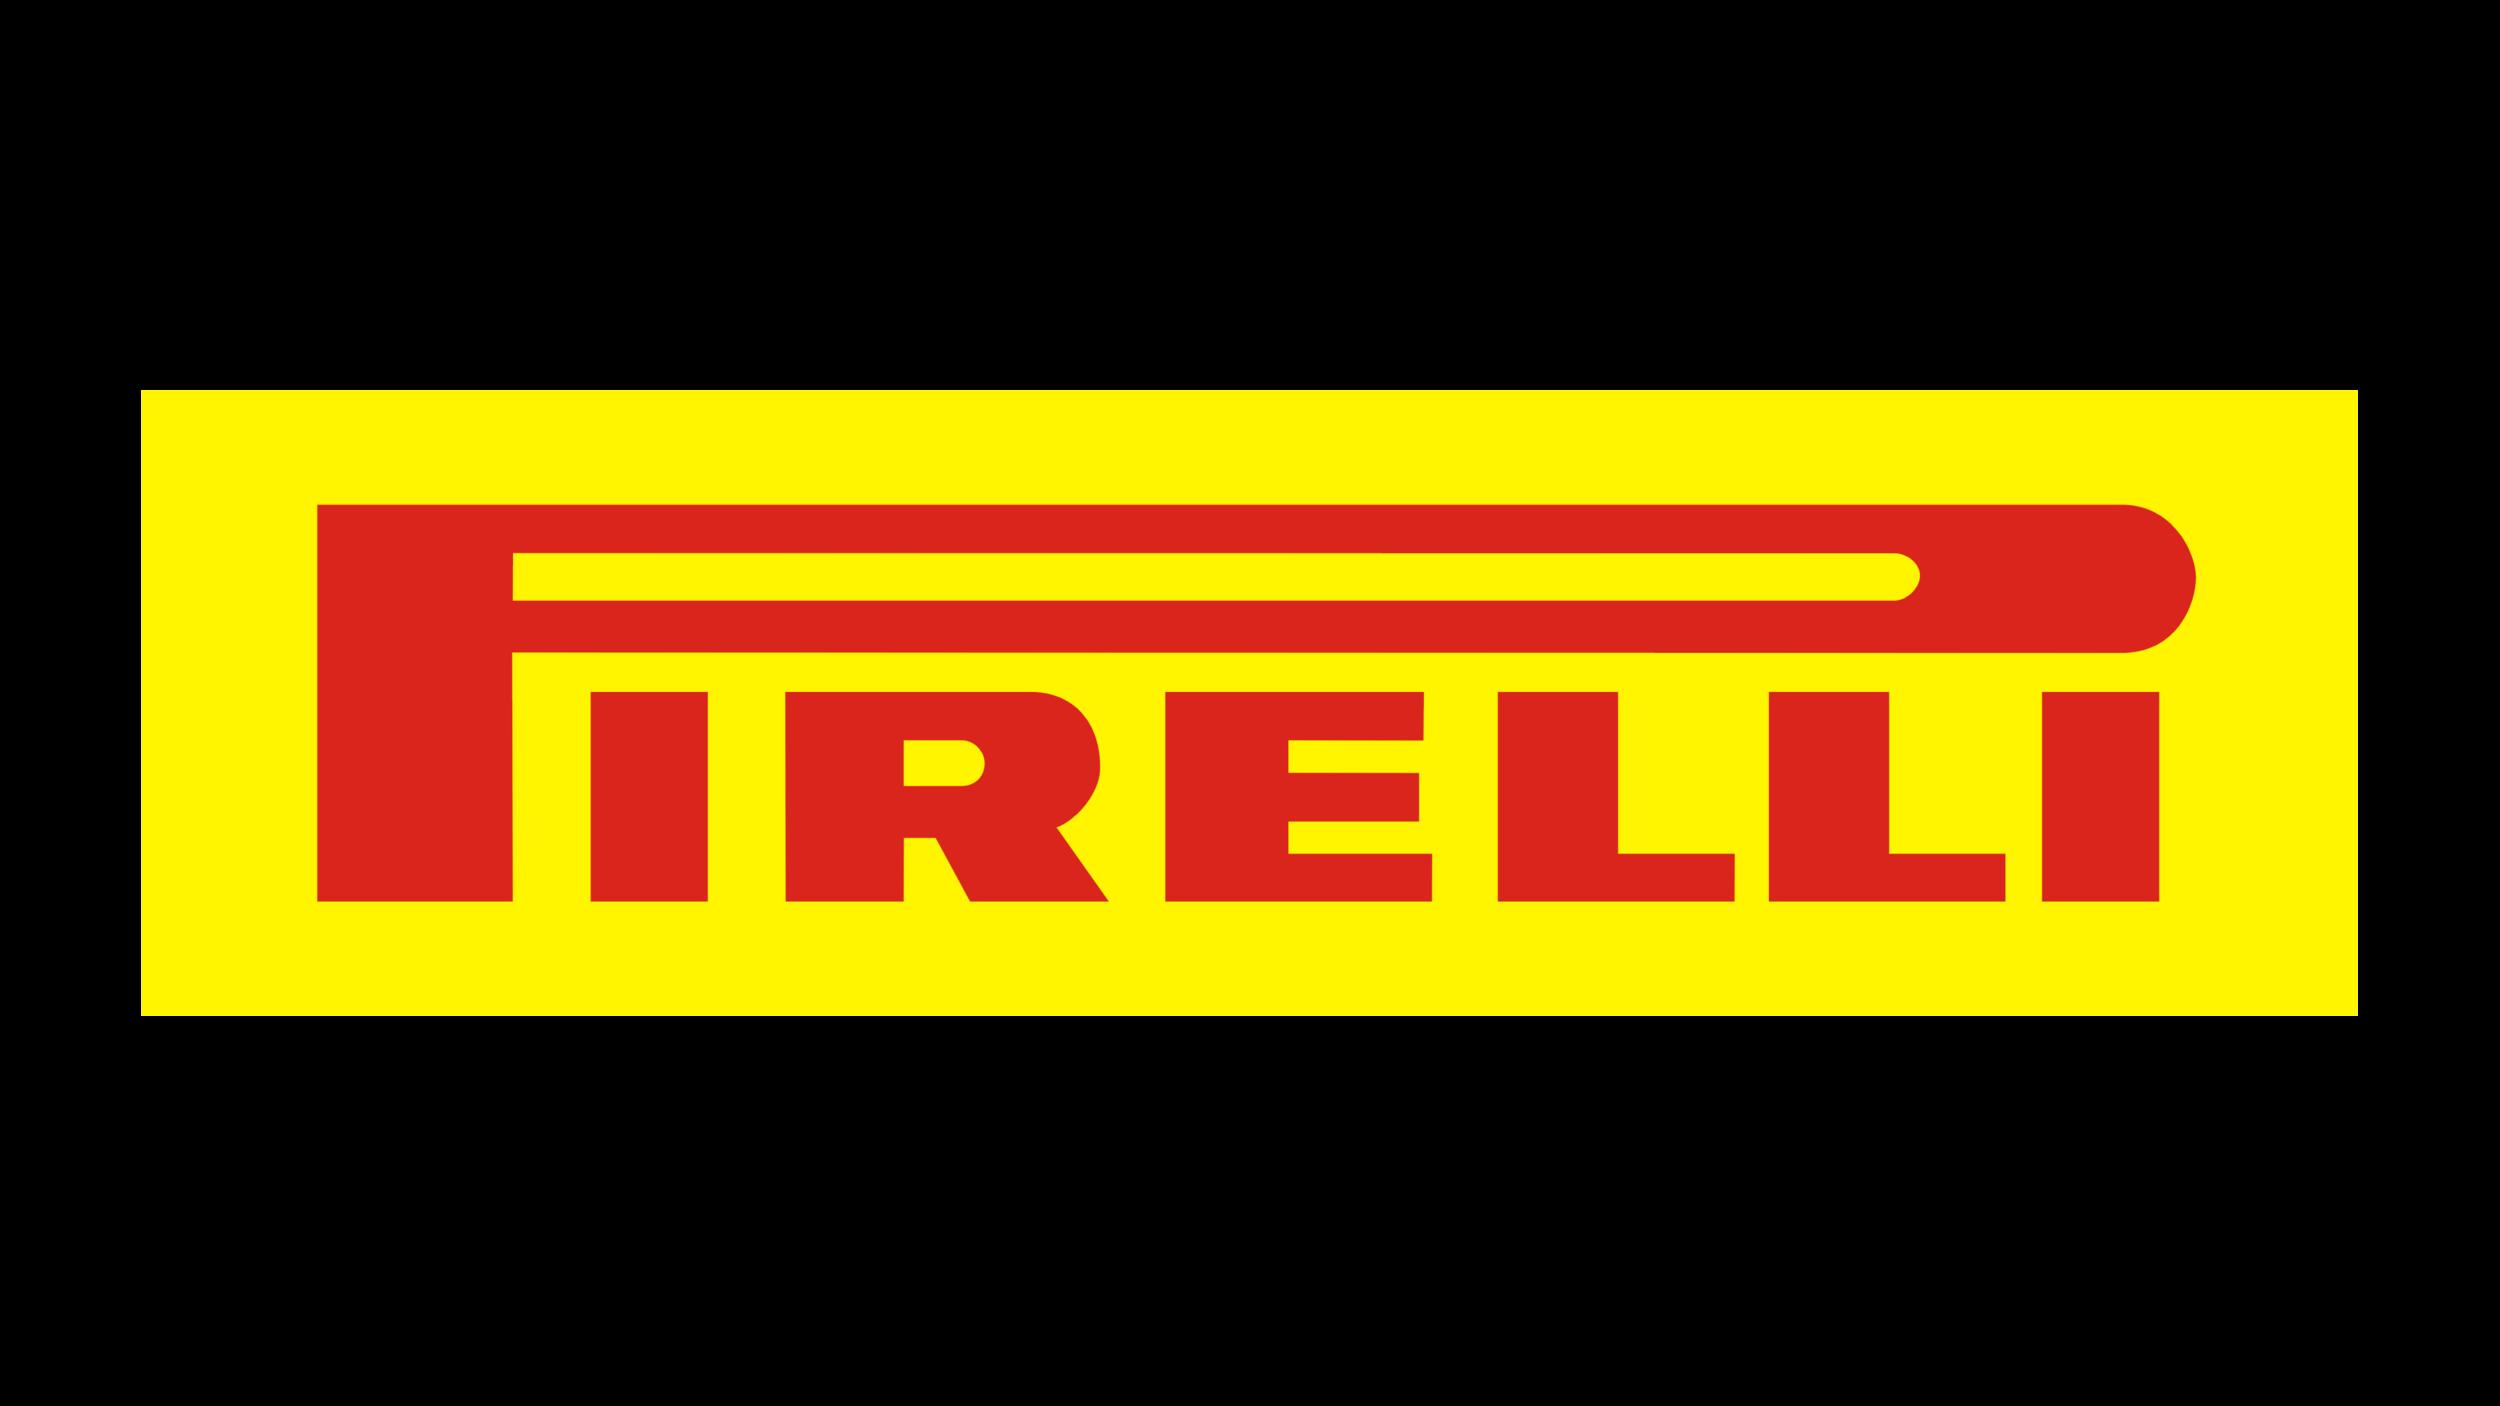 Pirelli-logo-3840x2160.png